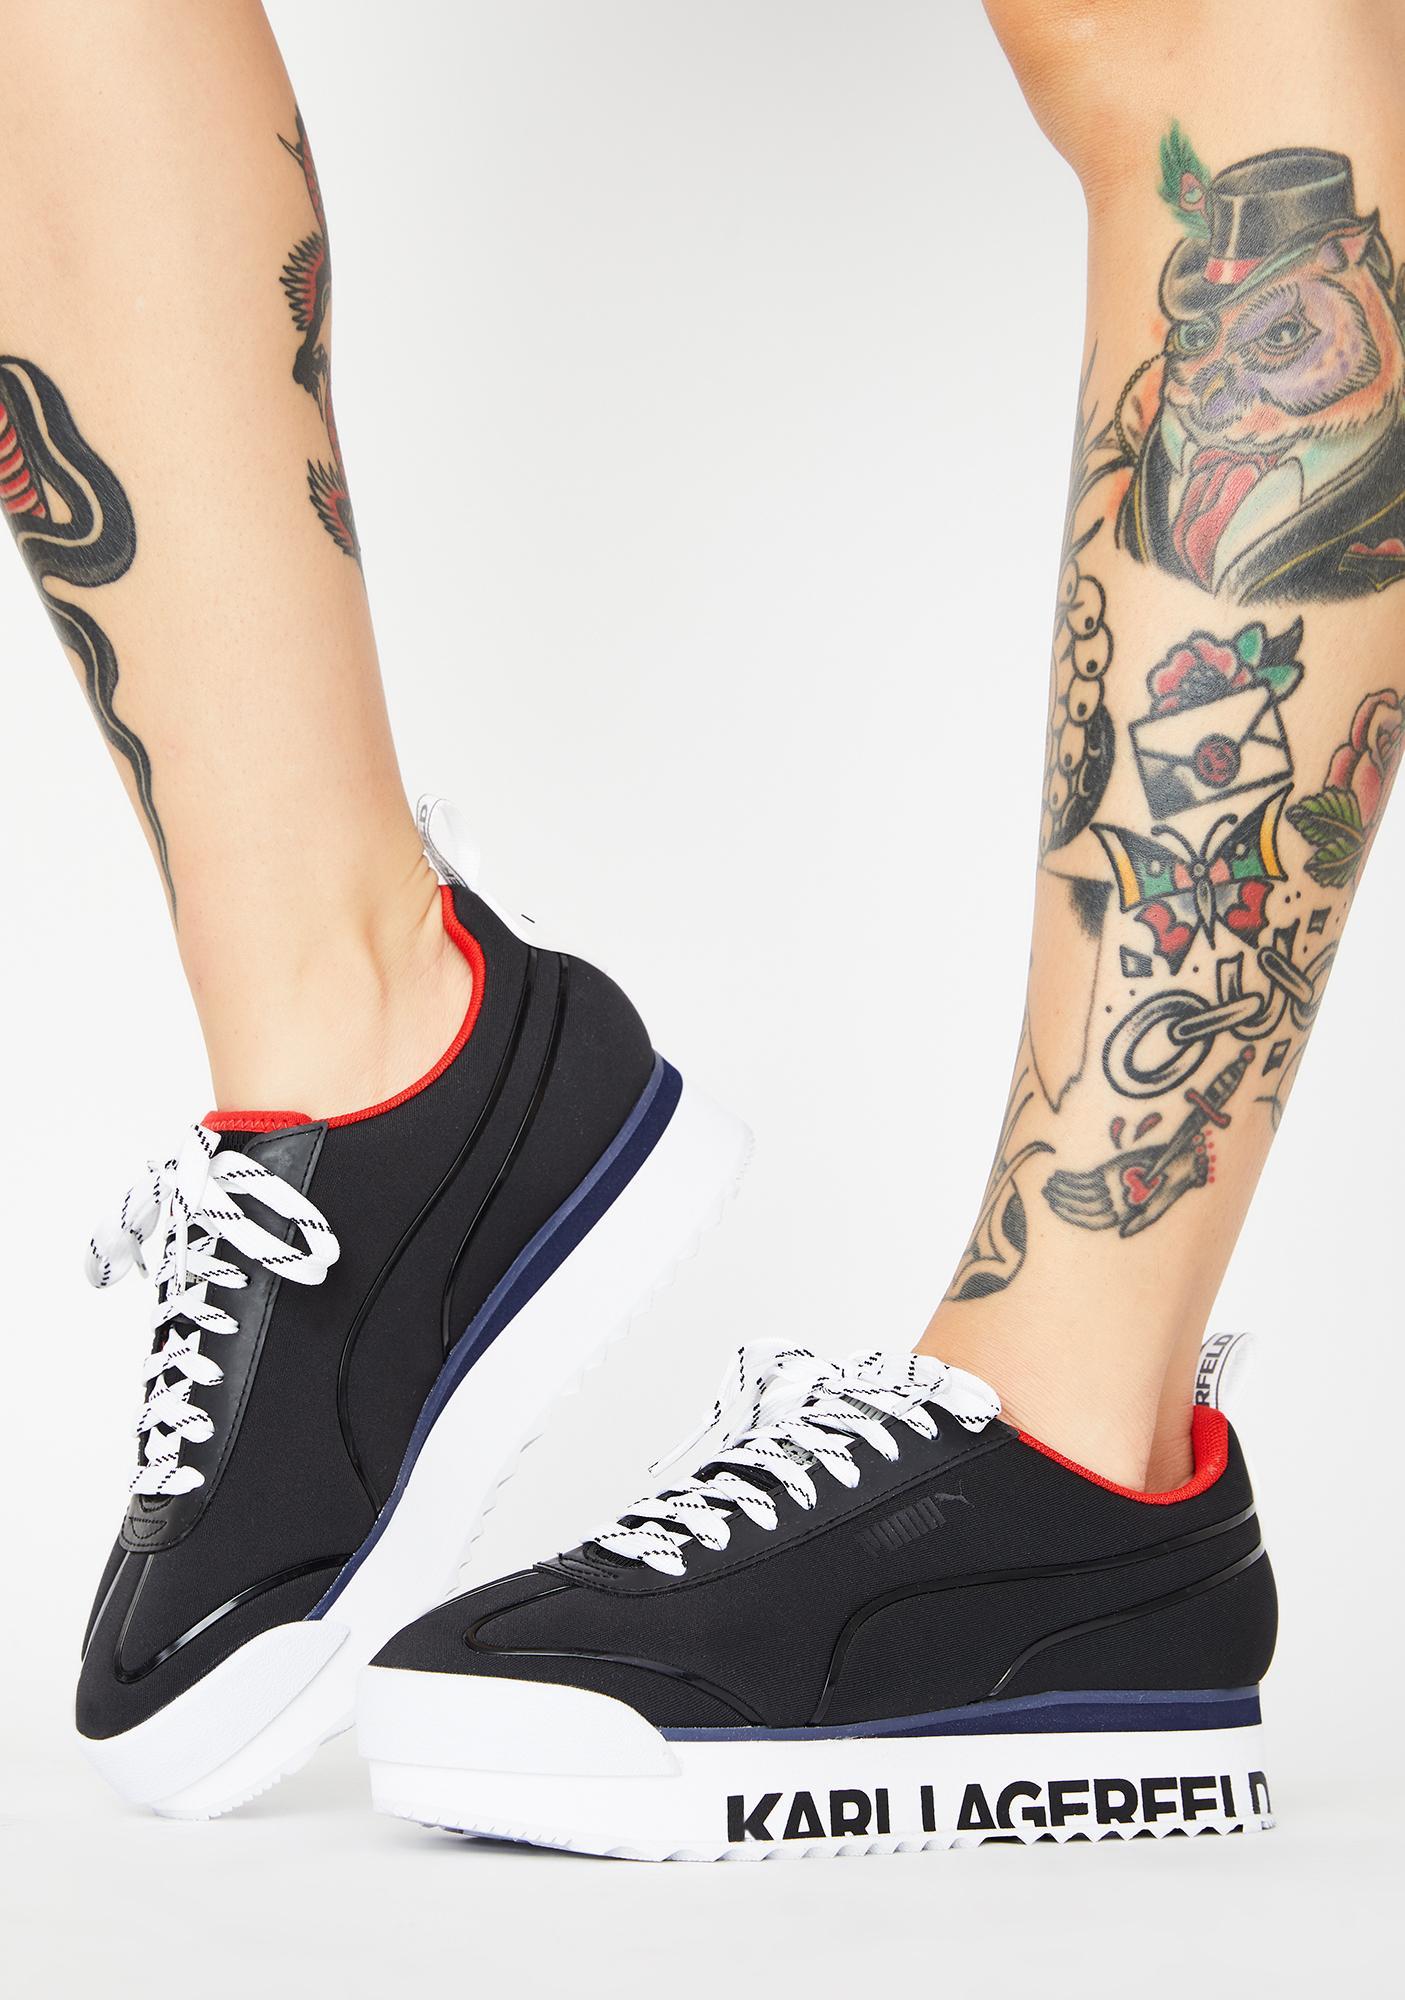 X Karl Lagerfeld Black Roma Amor Platform Sneakers by Puma